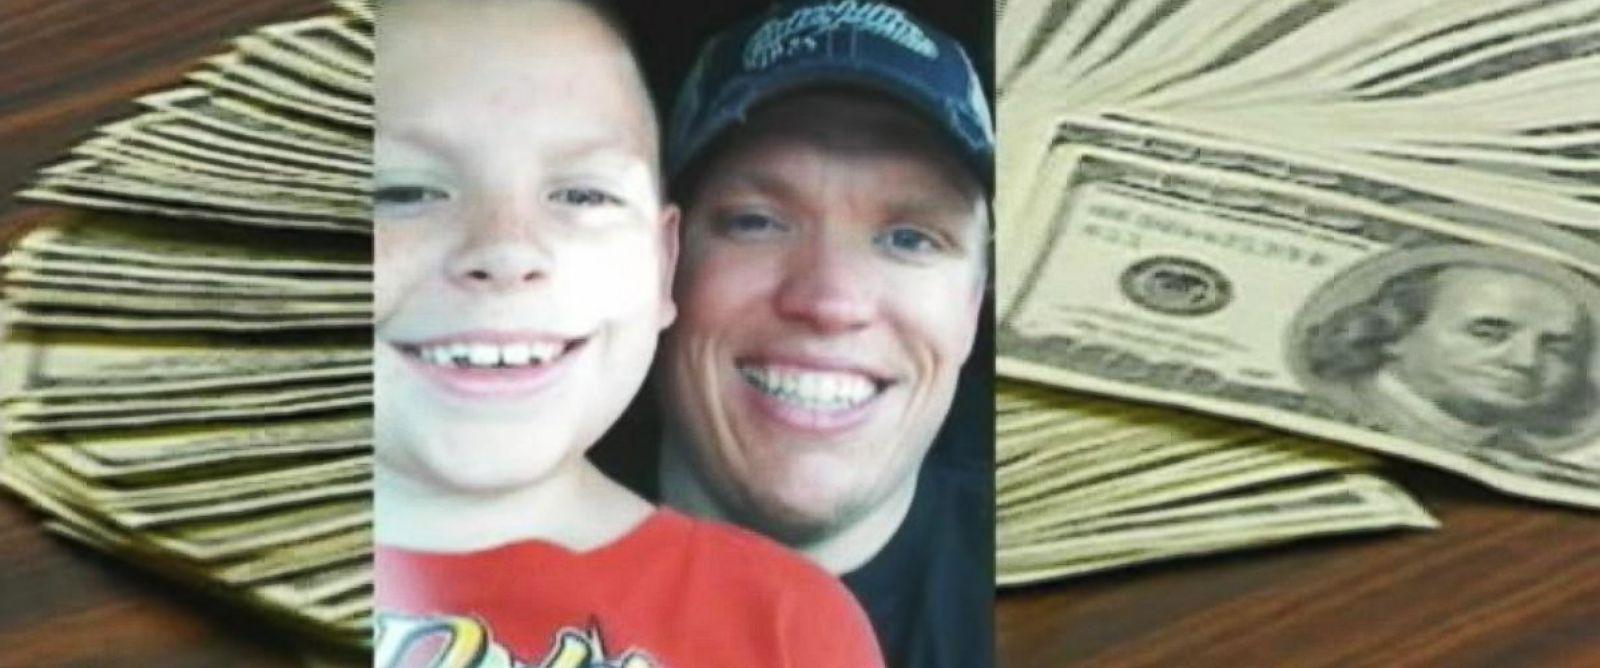 PHOTO: Tyler Schaefer found $10,000 in a hotel drawer in the Hilton Airport Hotel in Kansas City, Missouri.